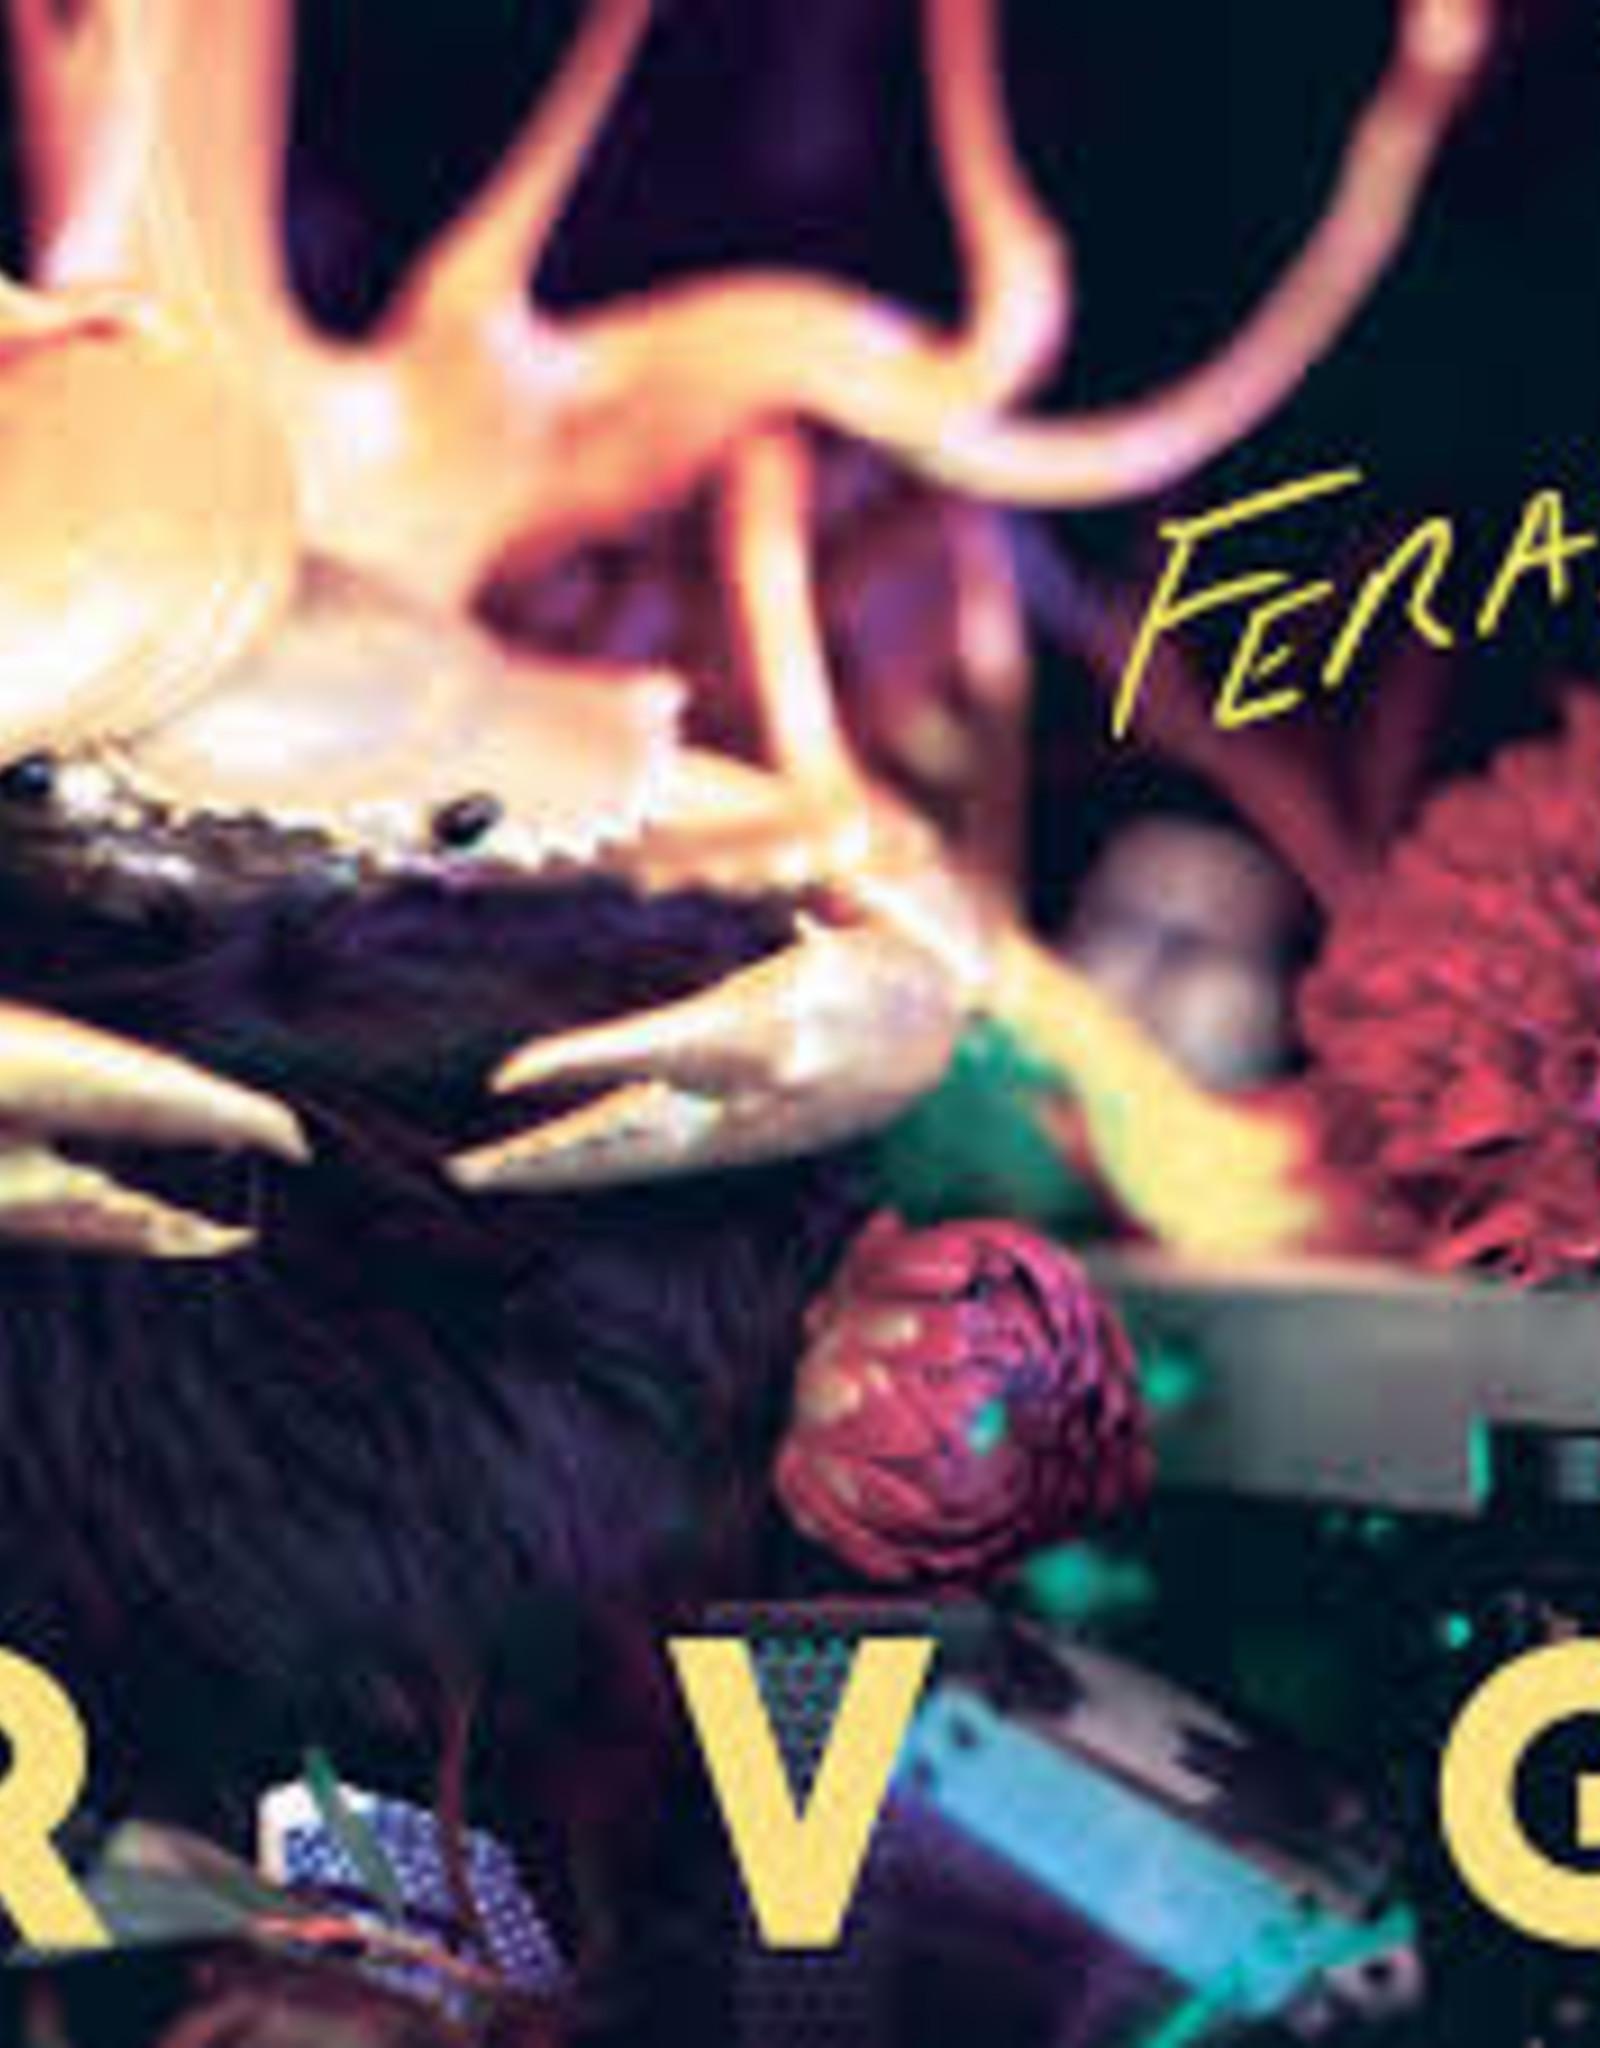 RVG - Feral (Yellow Vinyl)